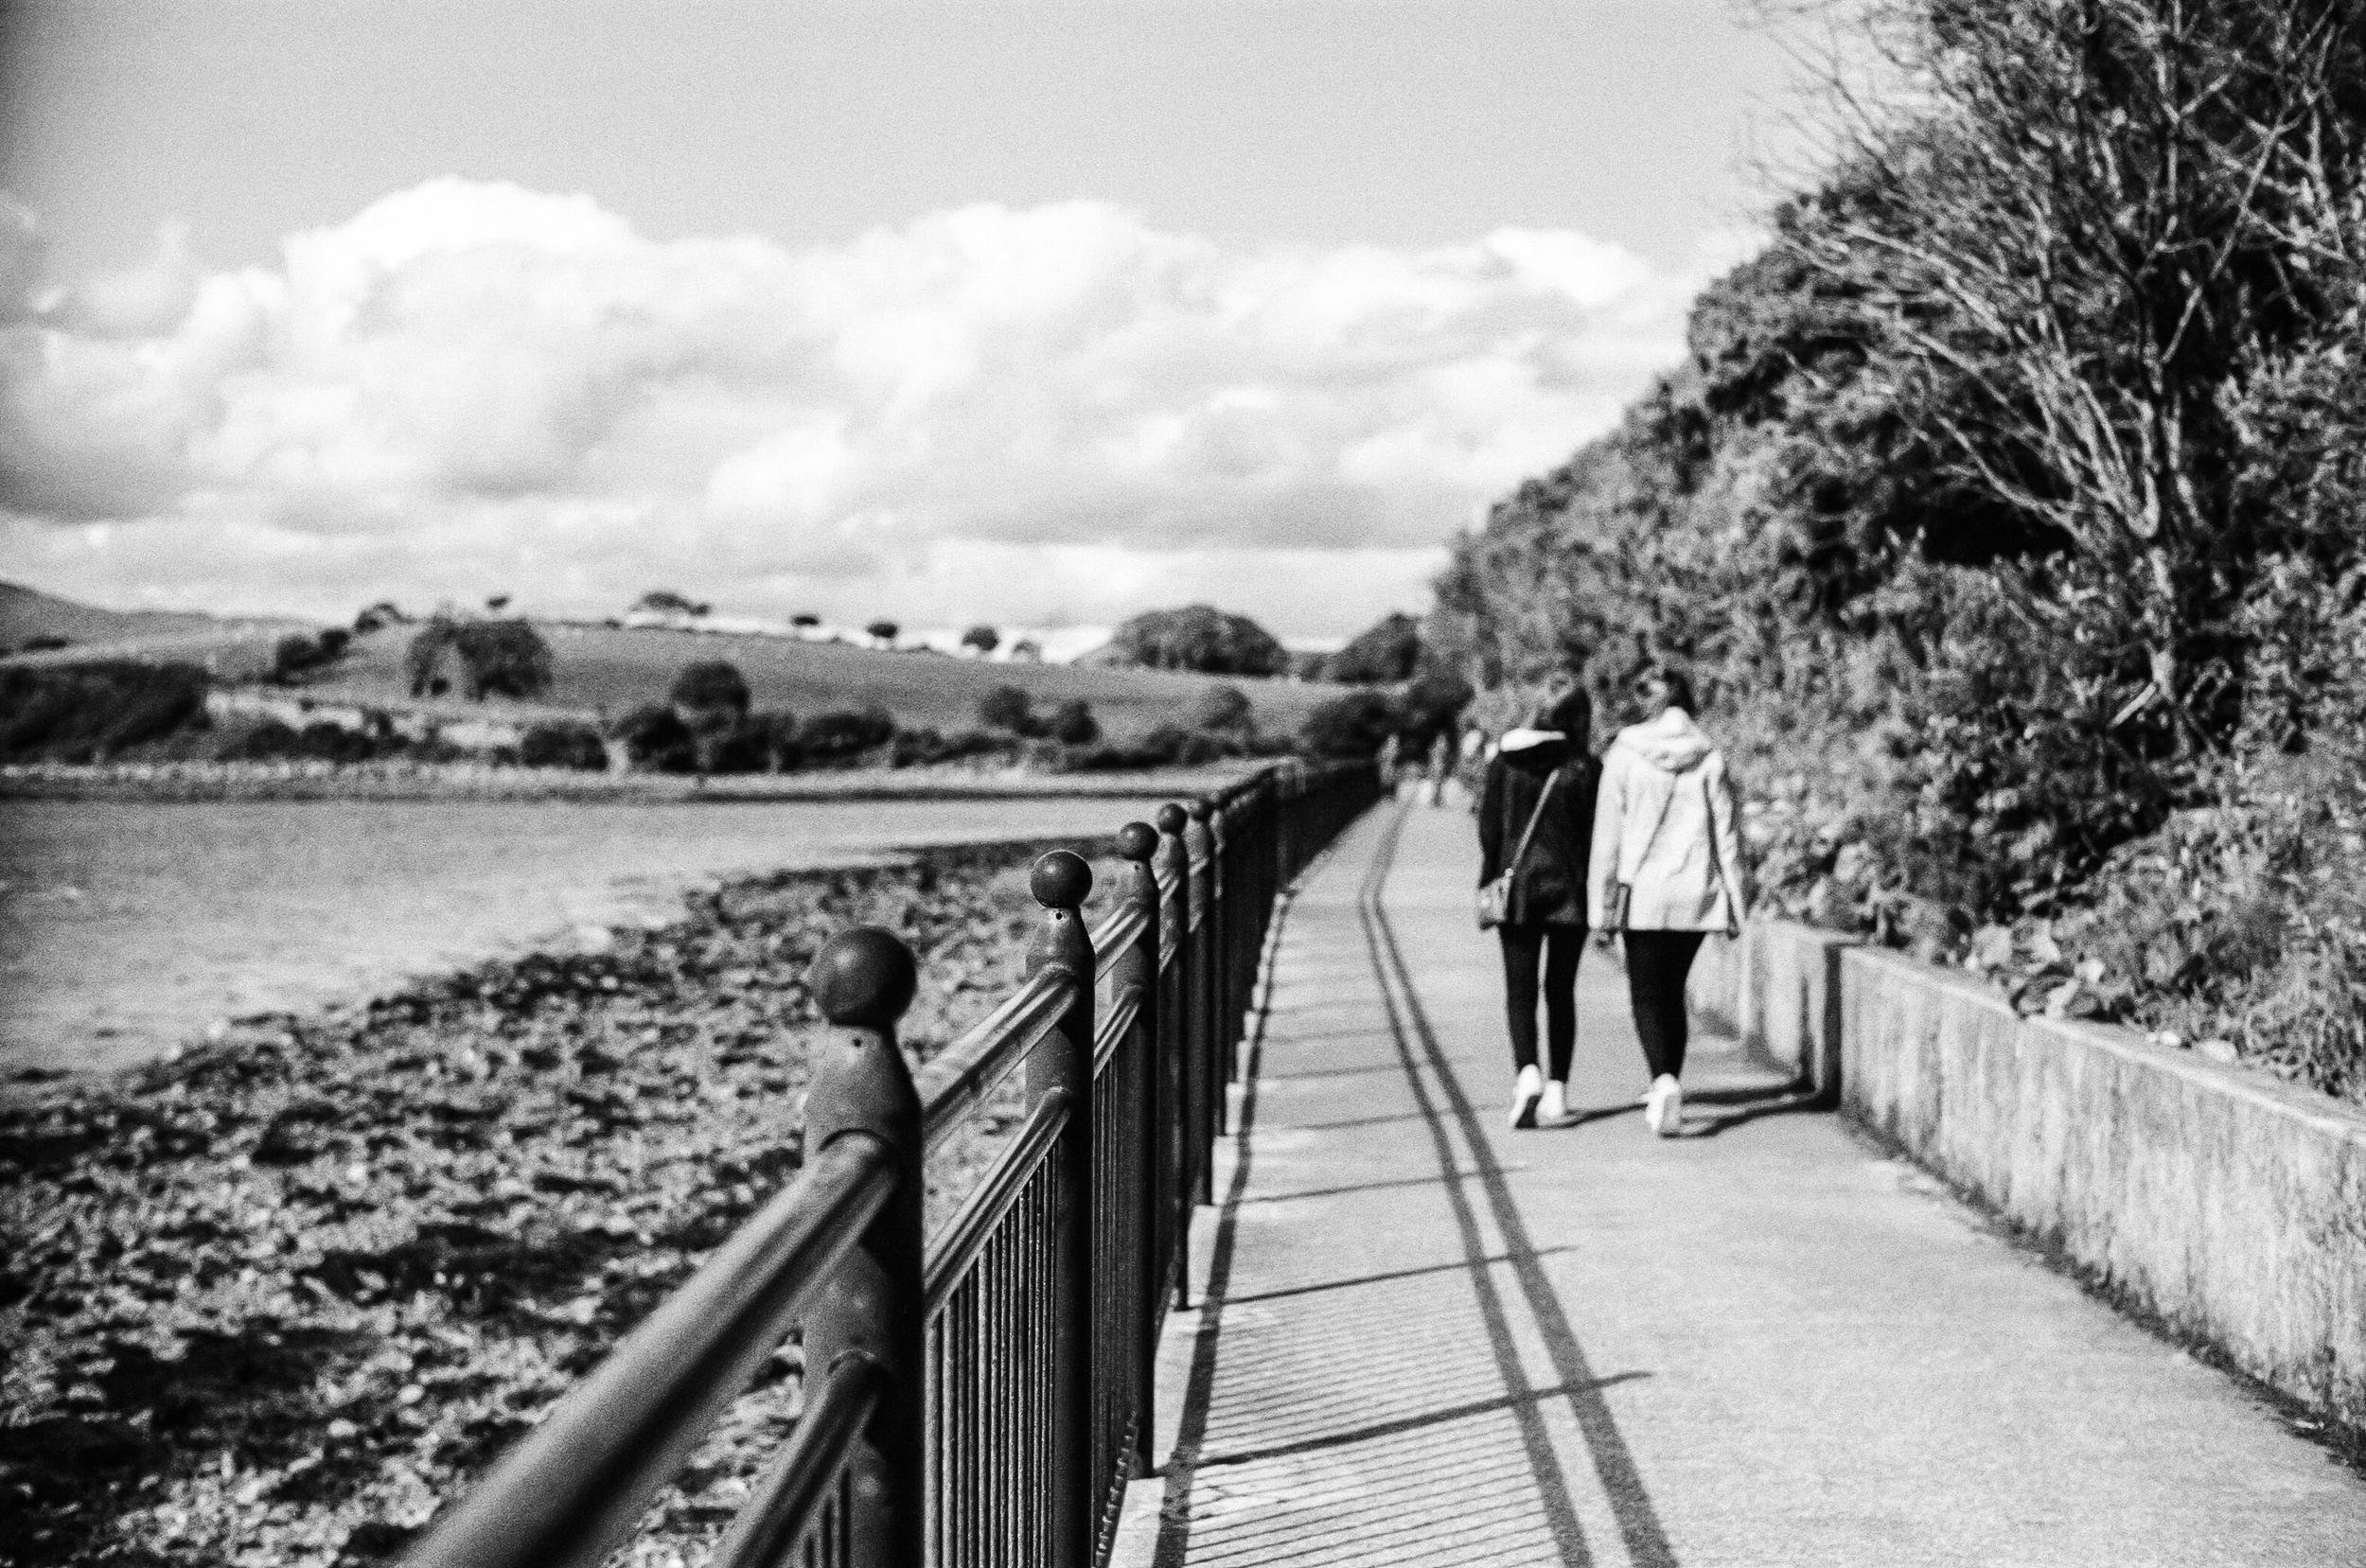 Walk Together   Leica MP   Summilux 50mm F/1.4   Kodak TX400   Michael Fauscette